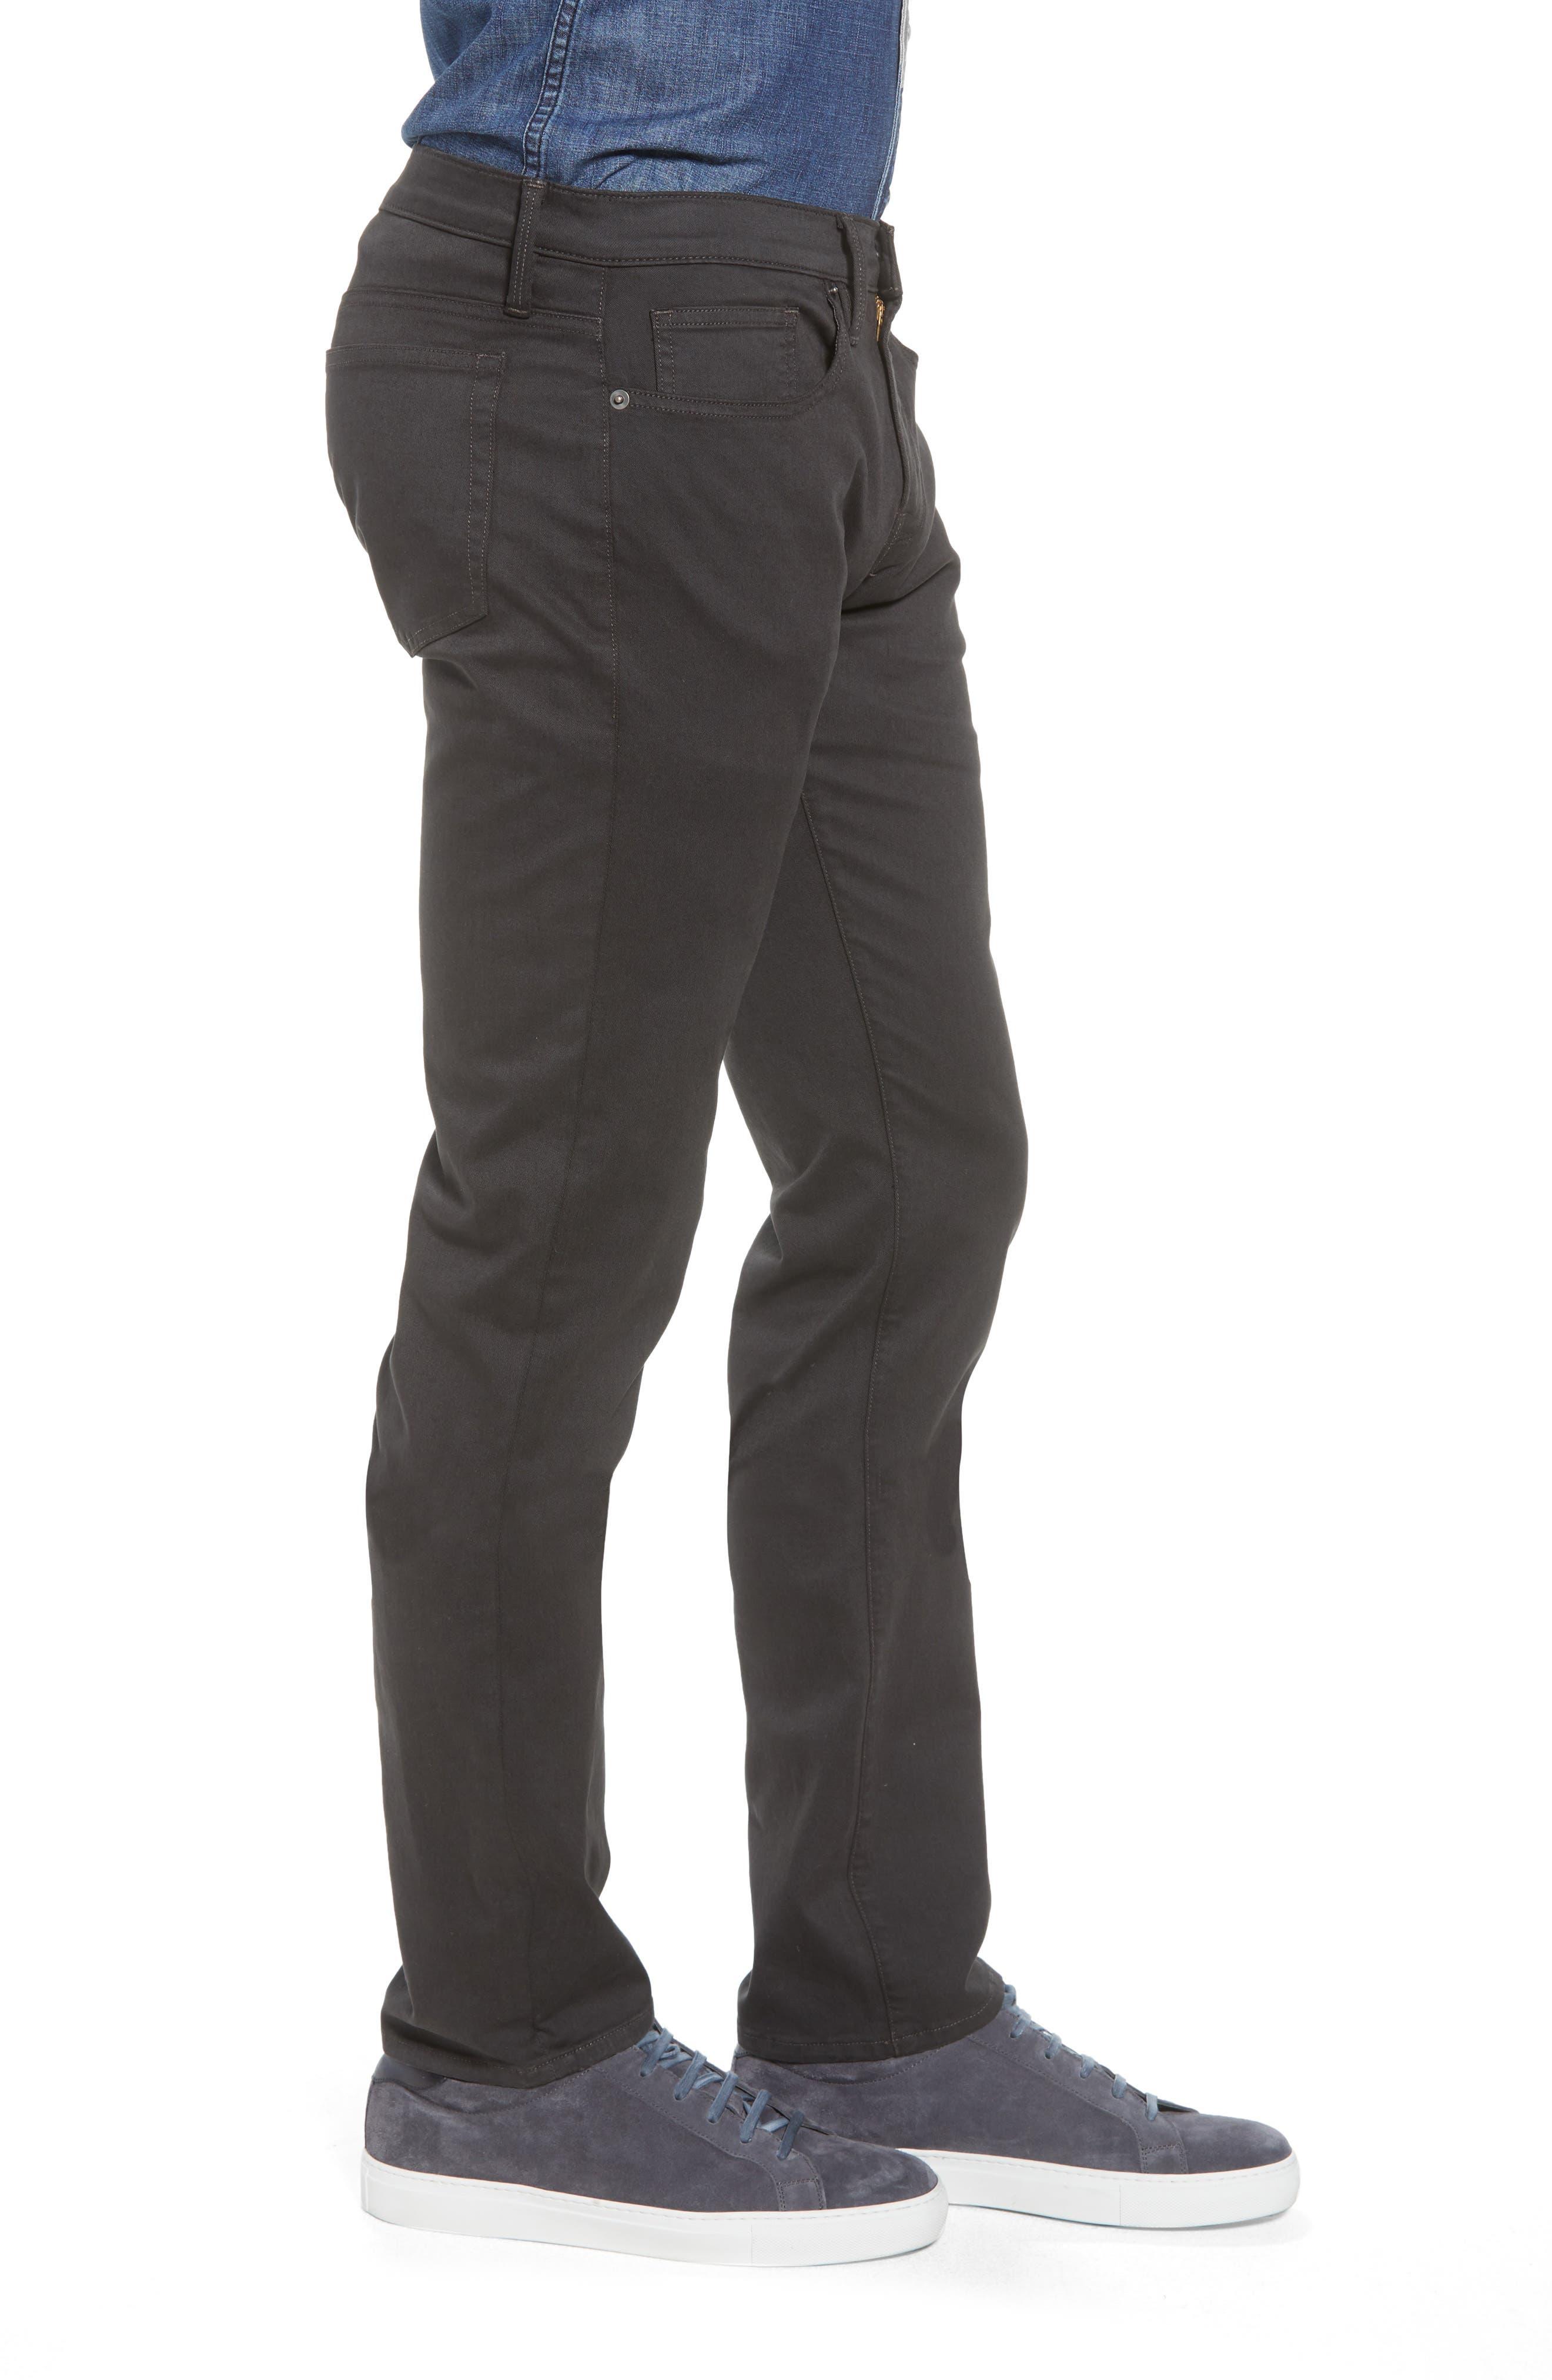 L'Homme Slim Fit Chino Pants,                             Alternate thumbnail 3, color,                             HEMATITE